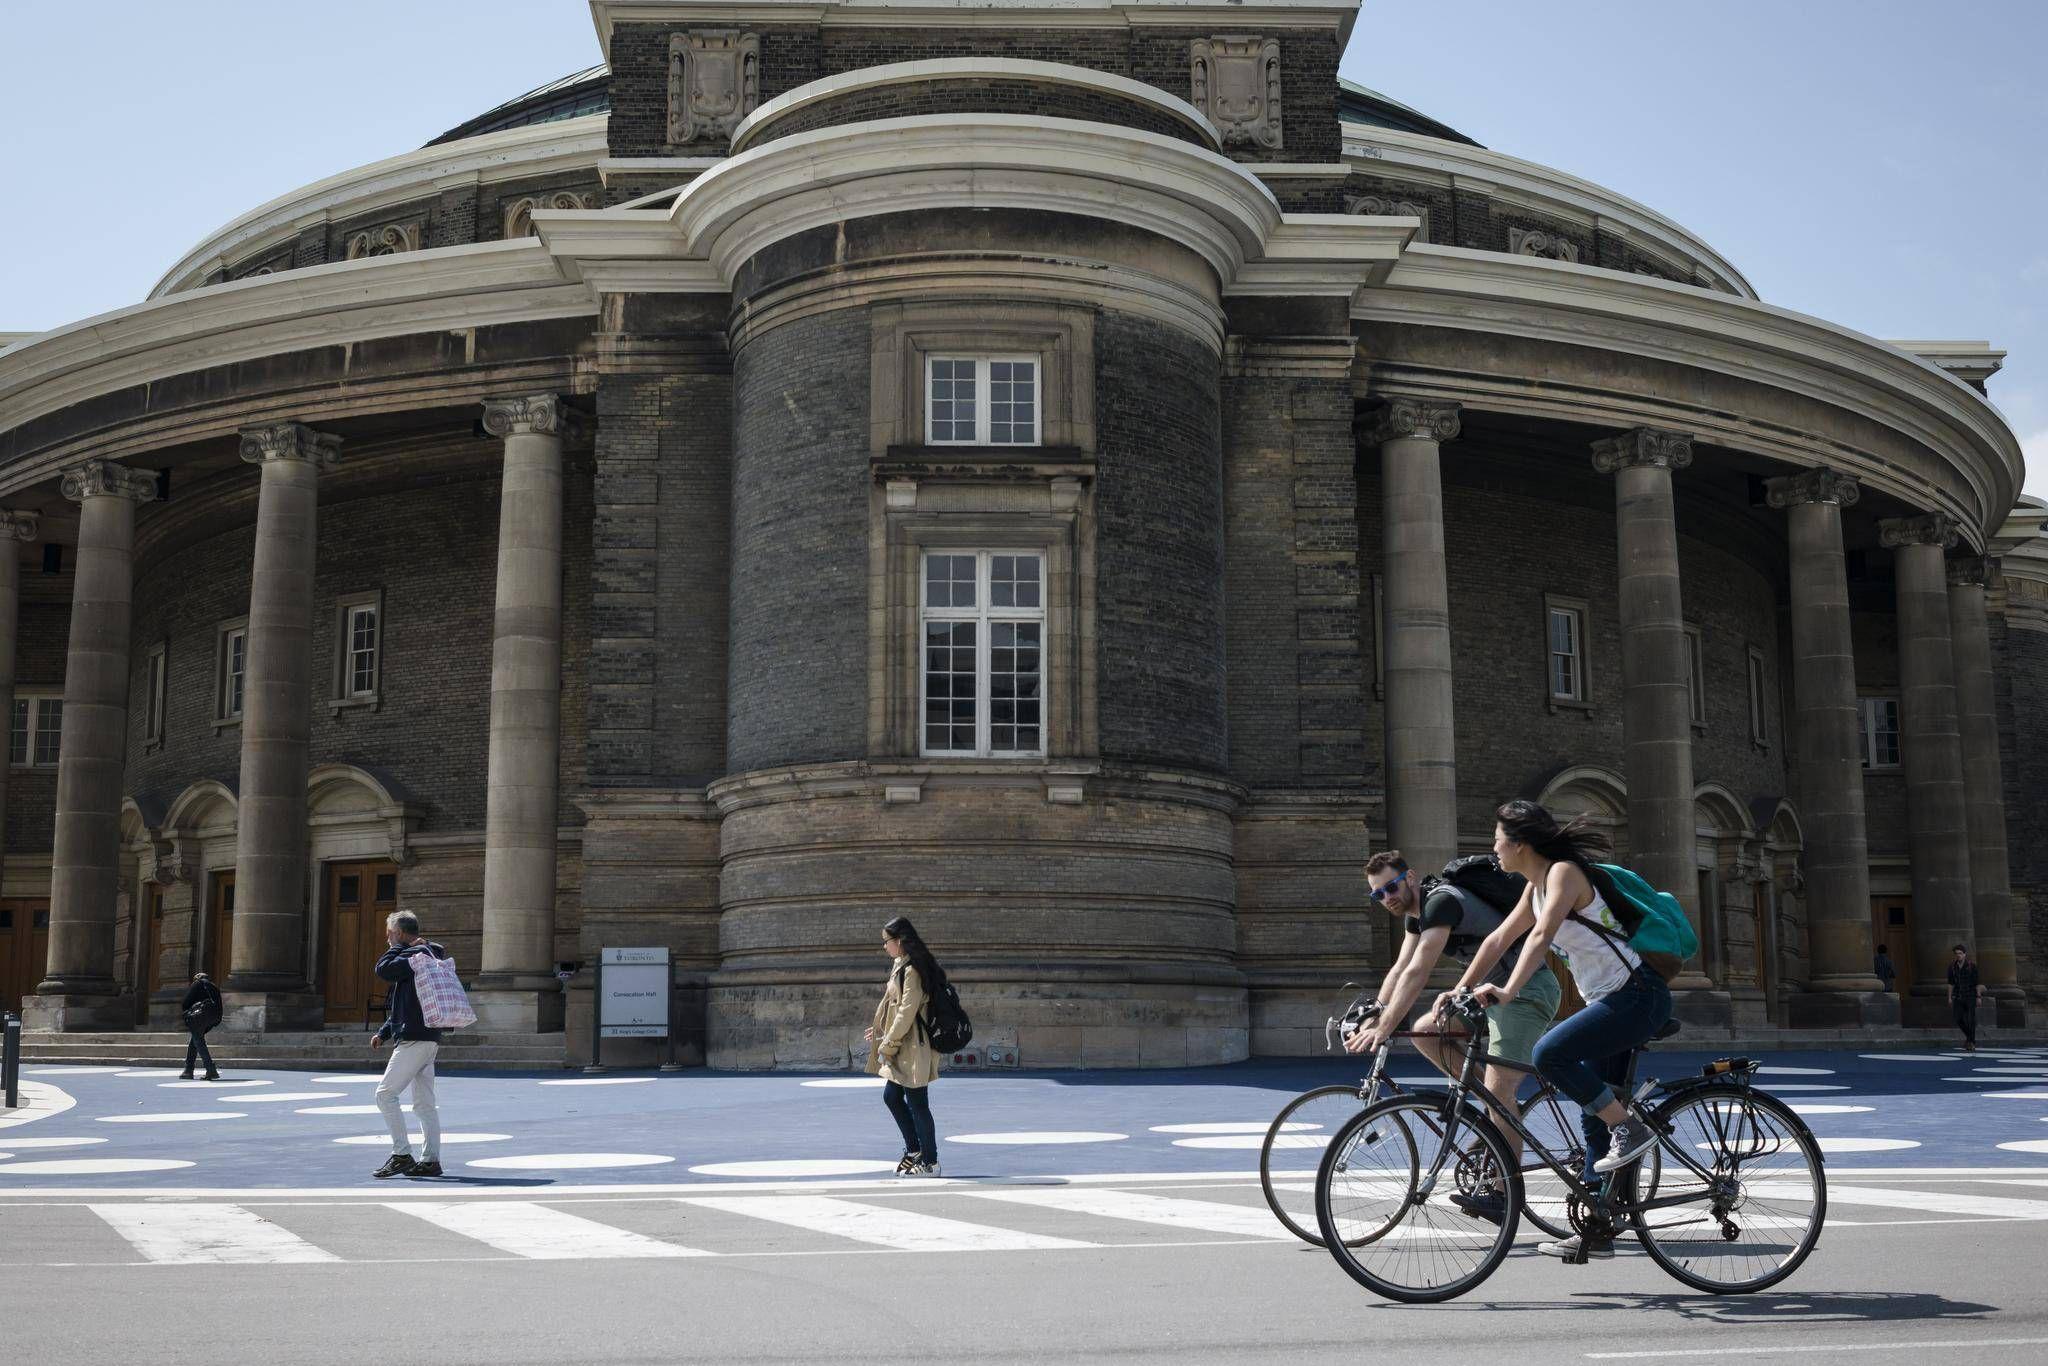 Canadian universities in battle to retain top spots in